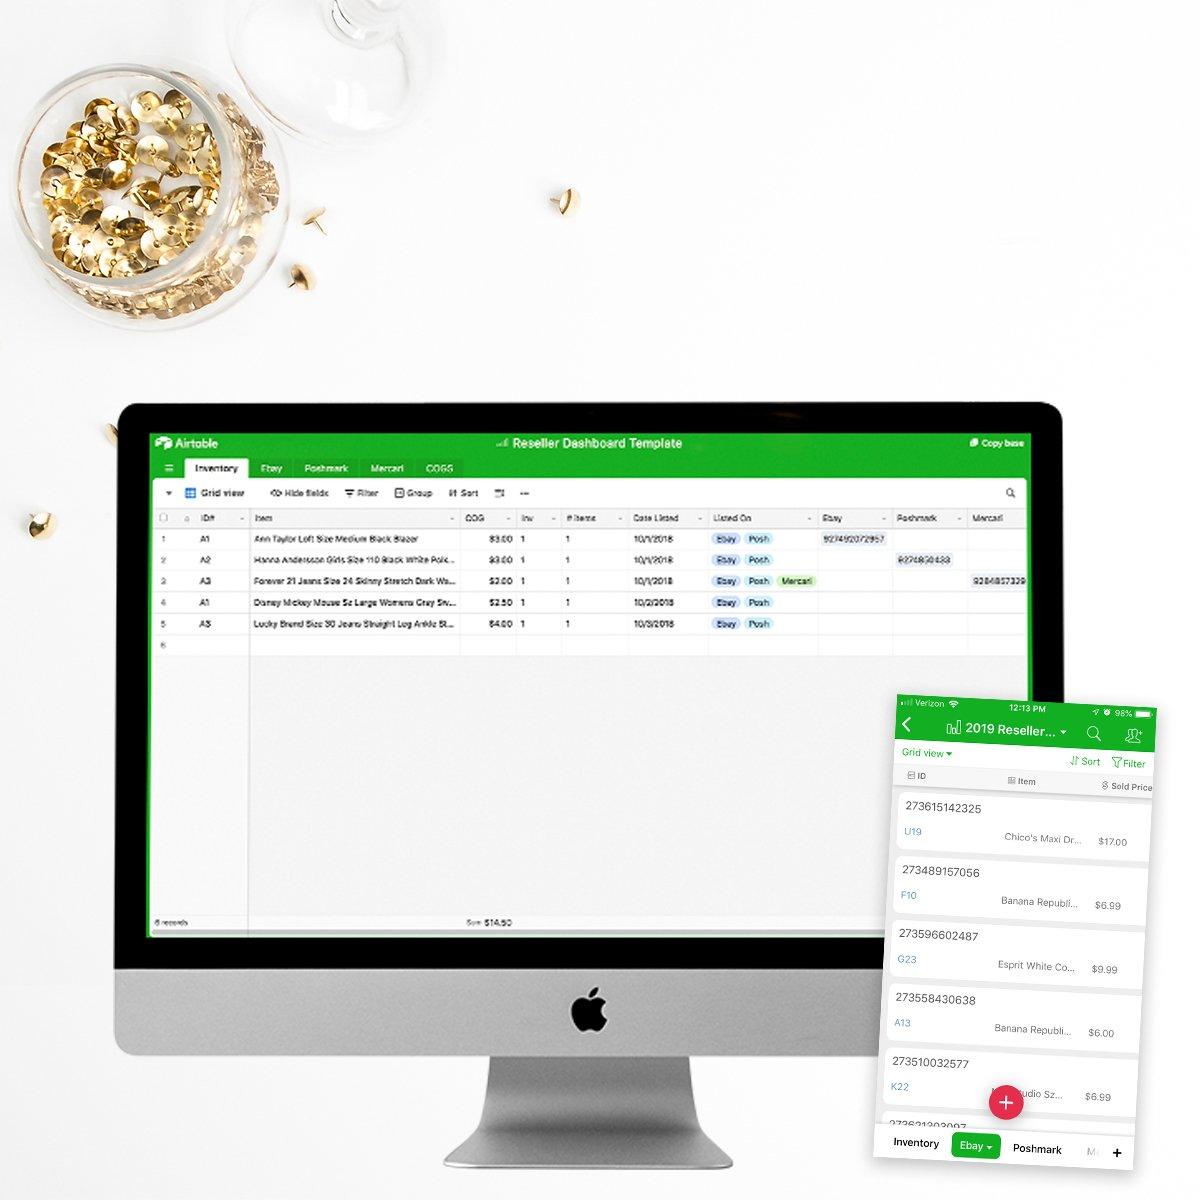 reseller-dashboard-spreadsheet